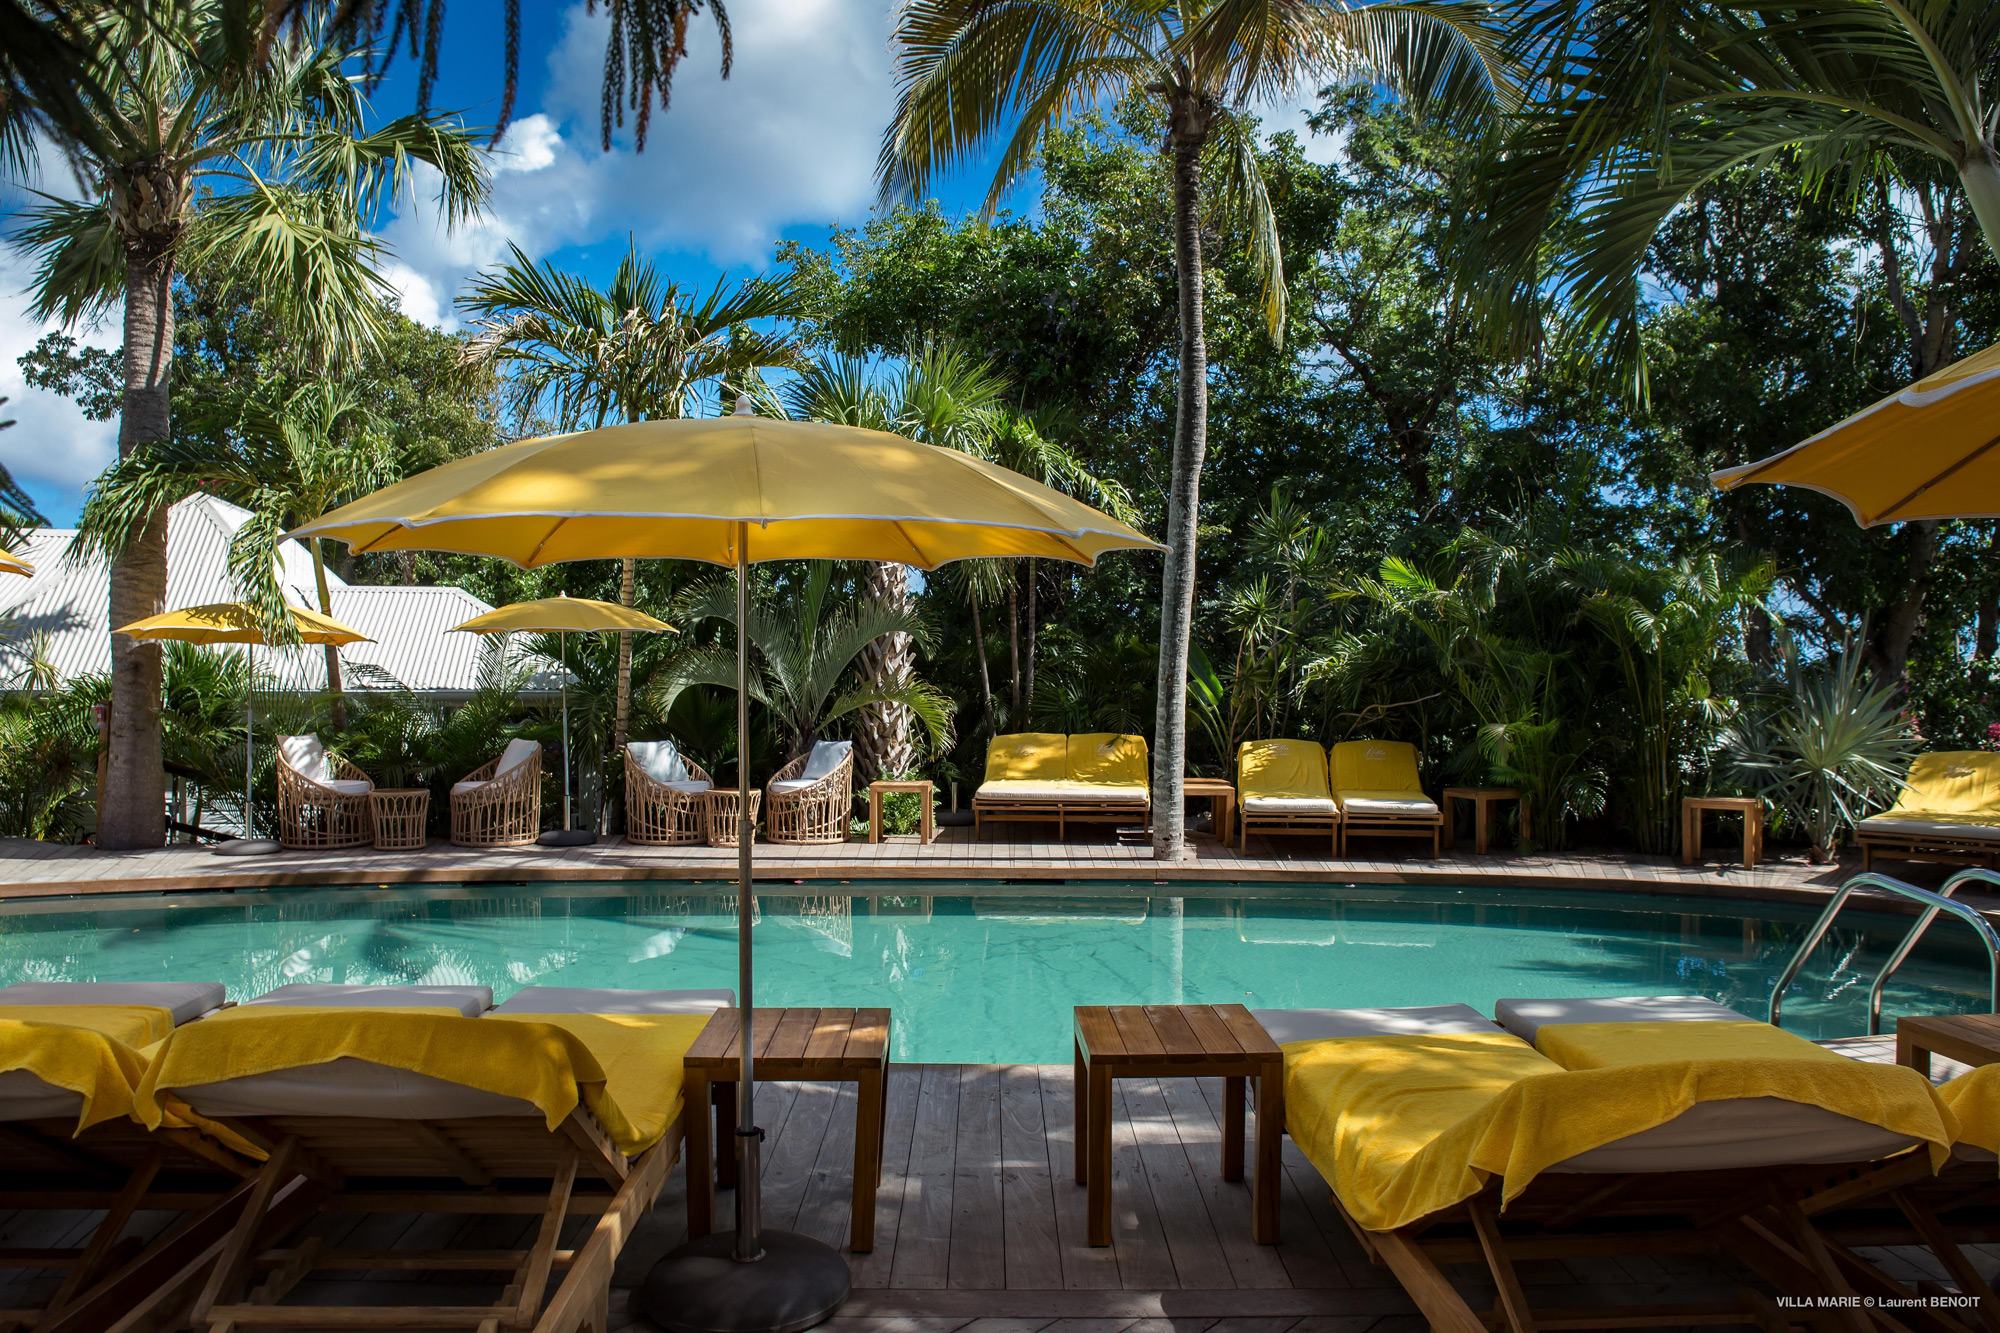 villa marie resort st. barths